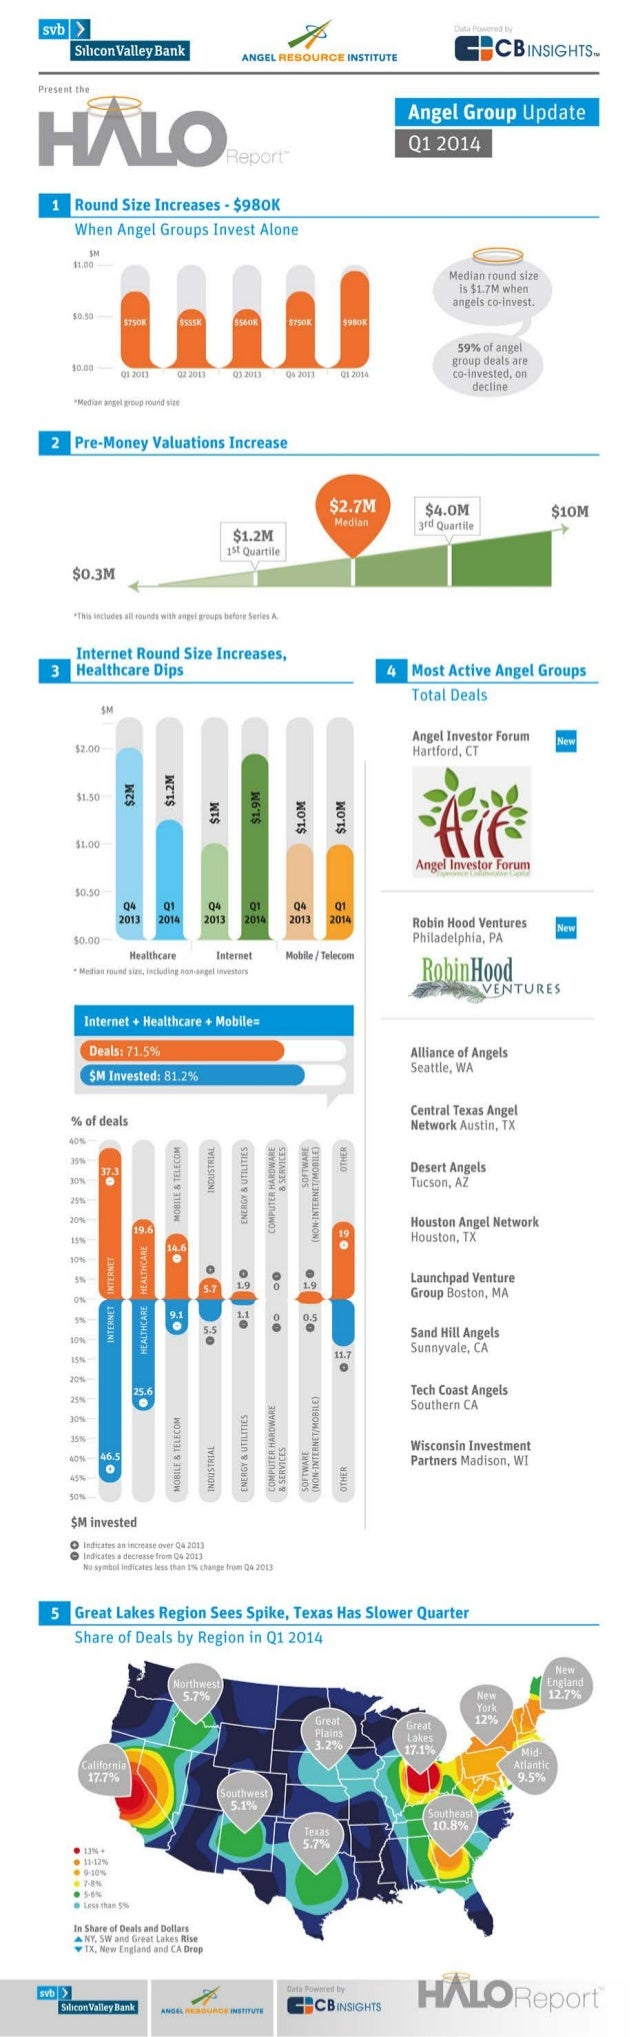 Q1 2014 Halo Report Infographic